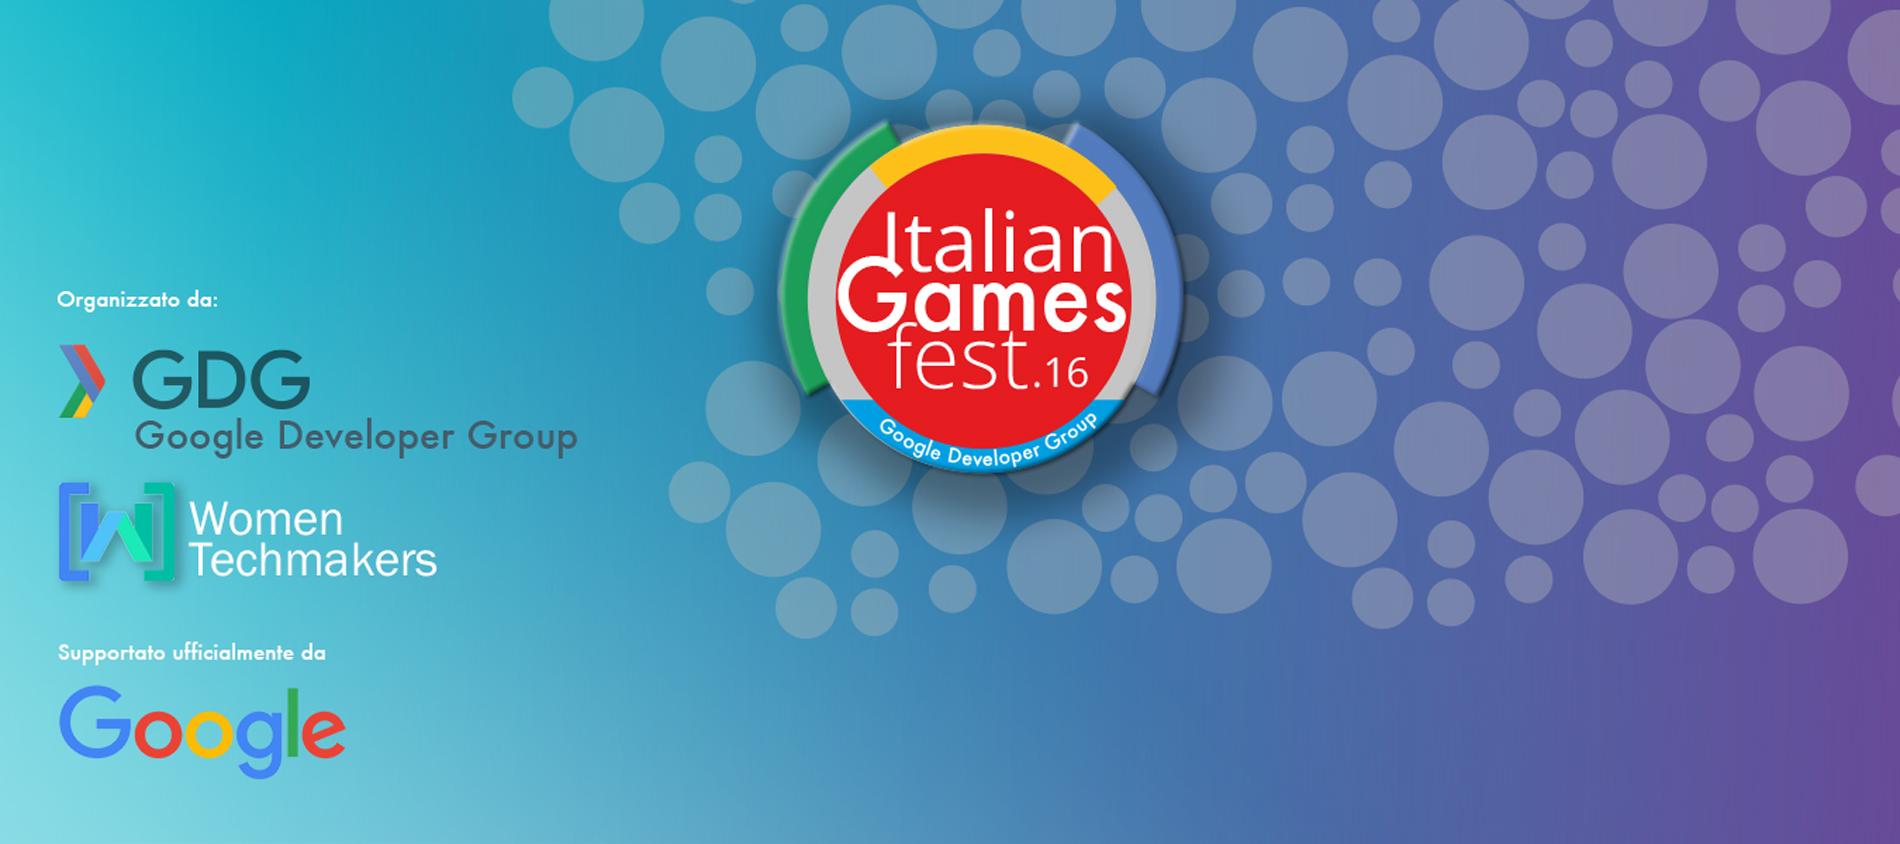 Italian Games Fest 2016 del GDG Nebrod